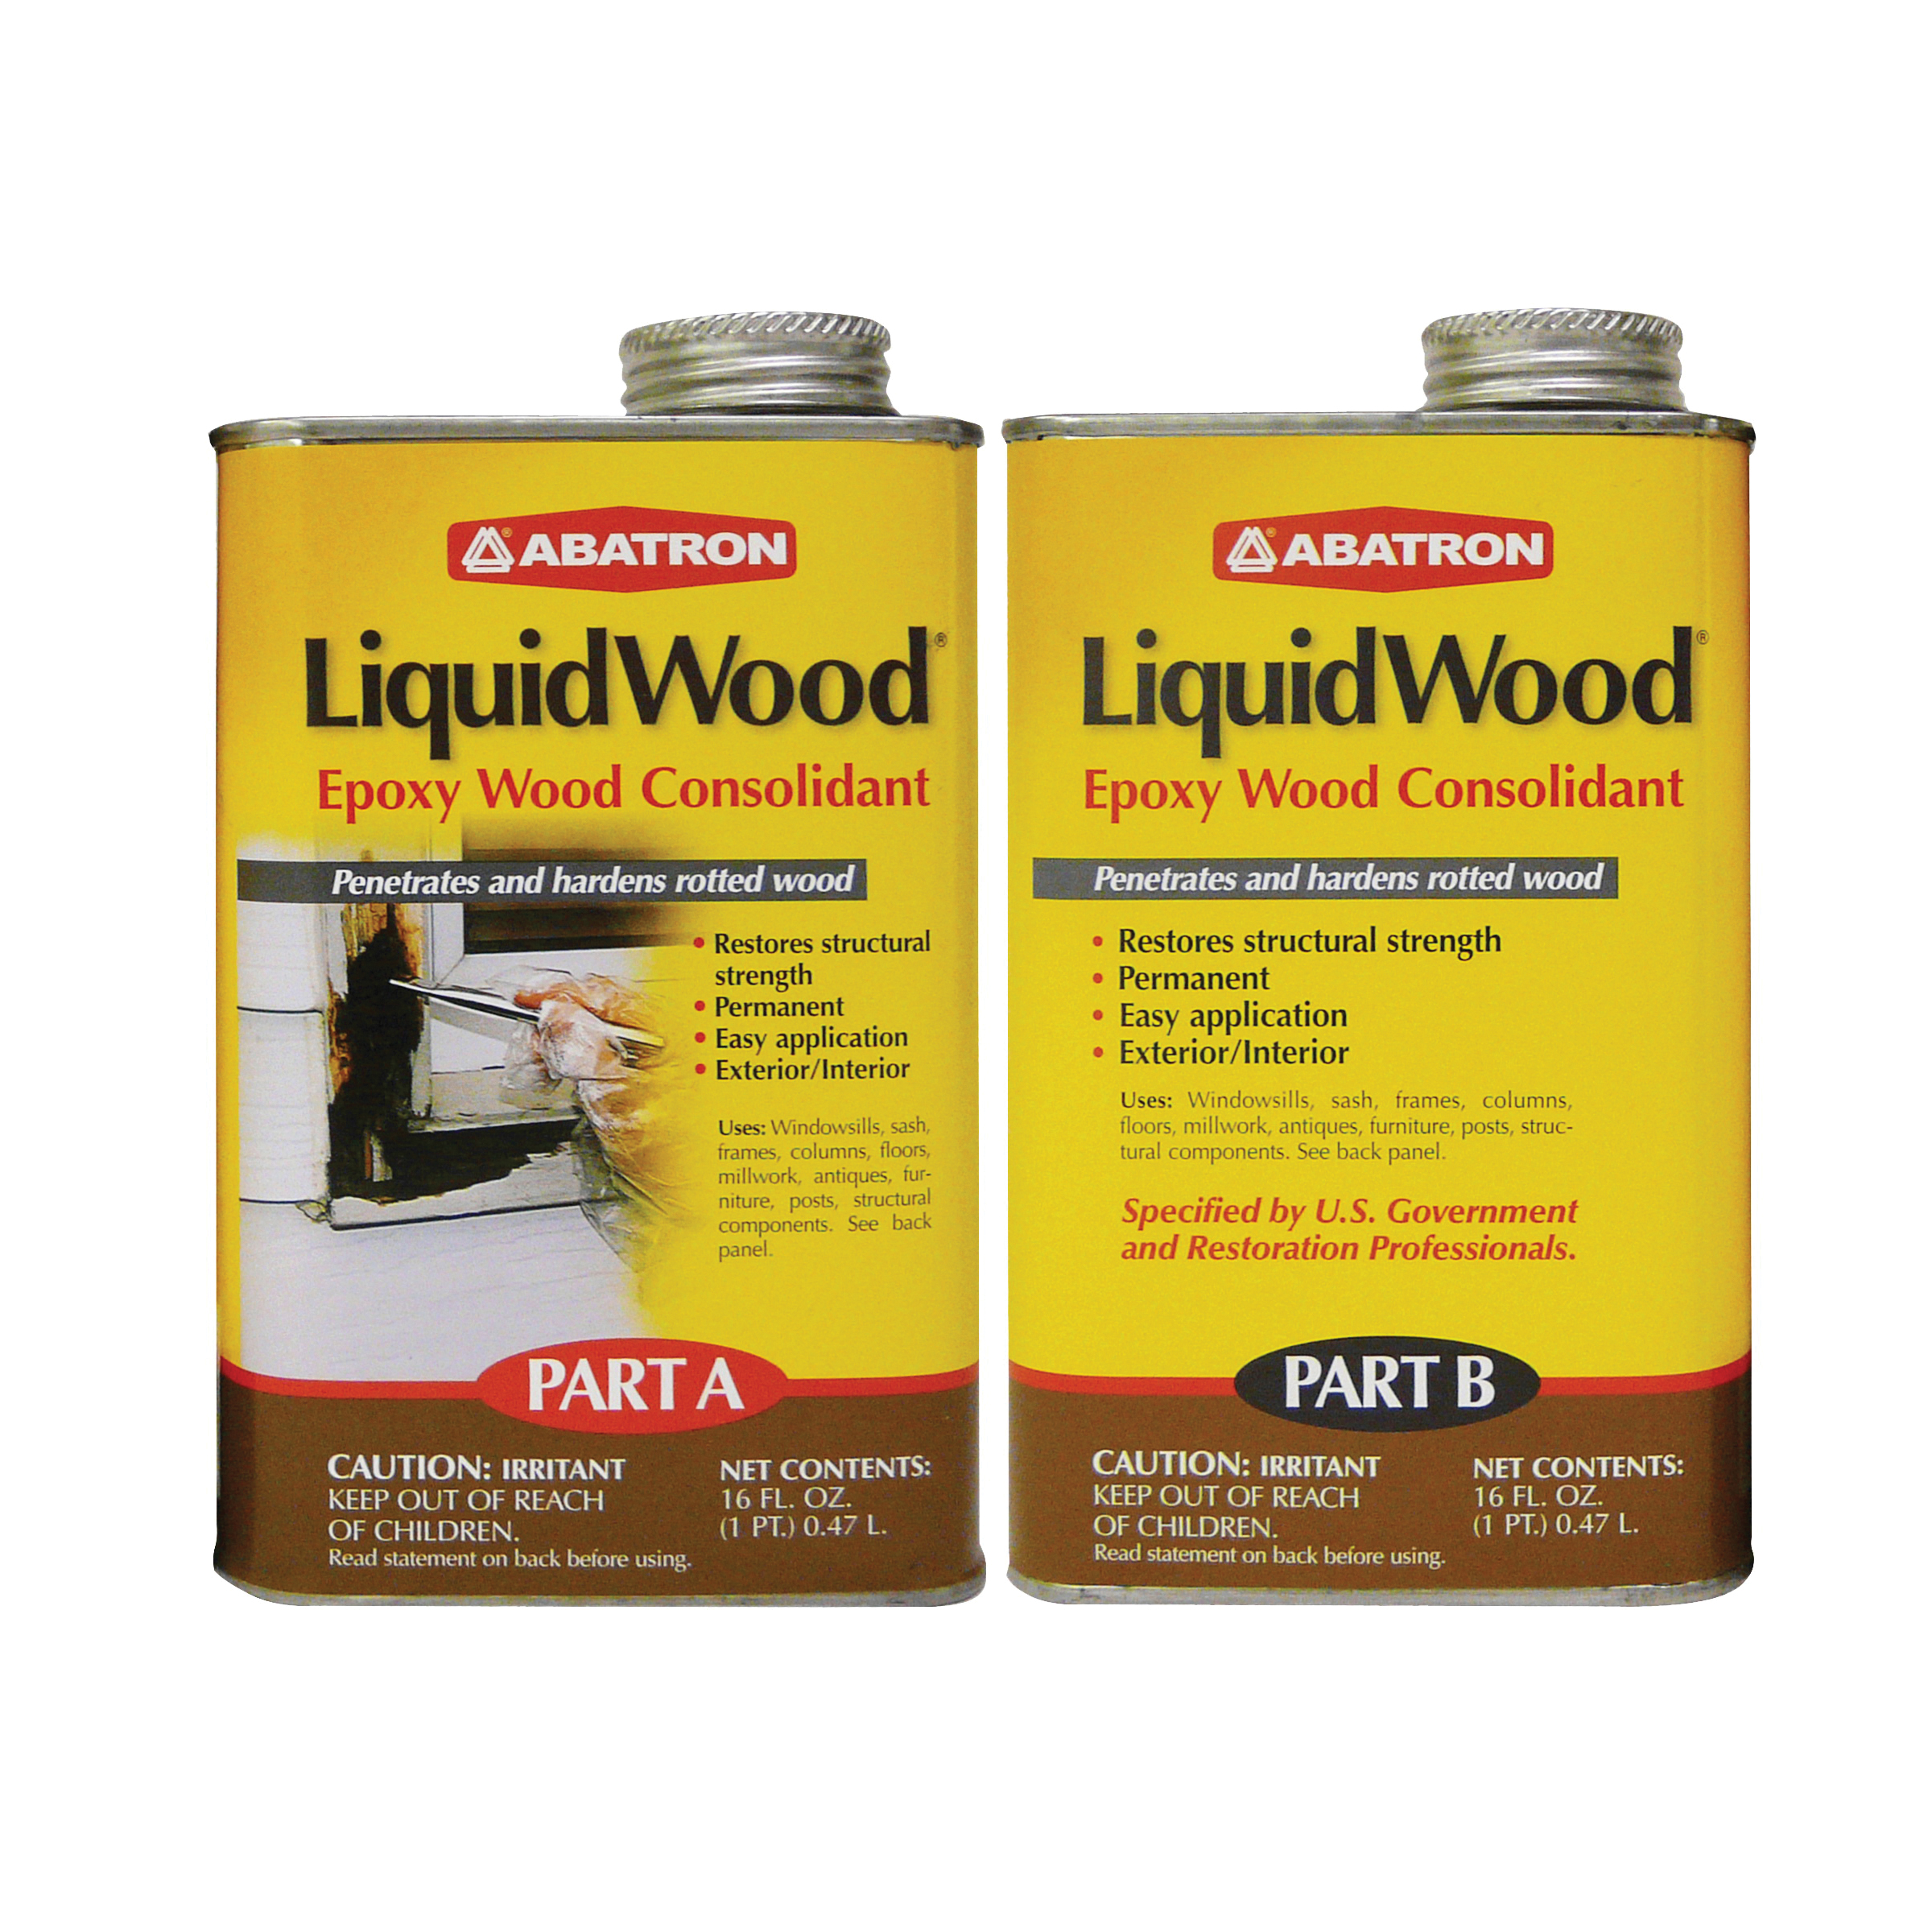 Picture of ABATRON LiquidWood LW2PKR Wood Filler, Liquid, Faint, Slightly Aromatic Part A, Irritating Ammonia Part B, Clear